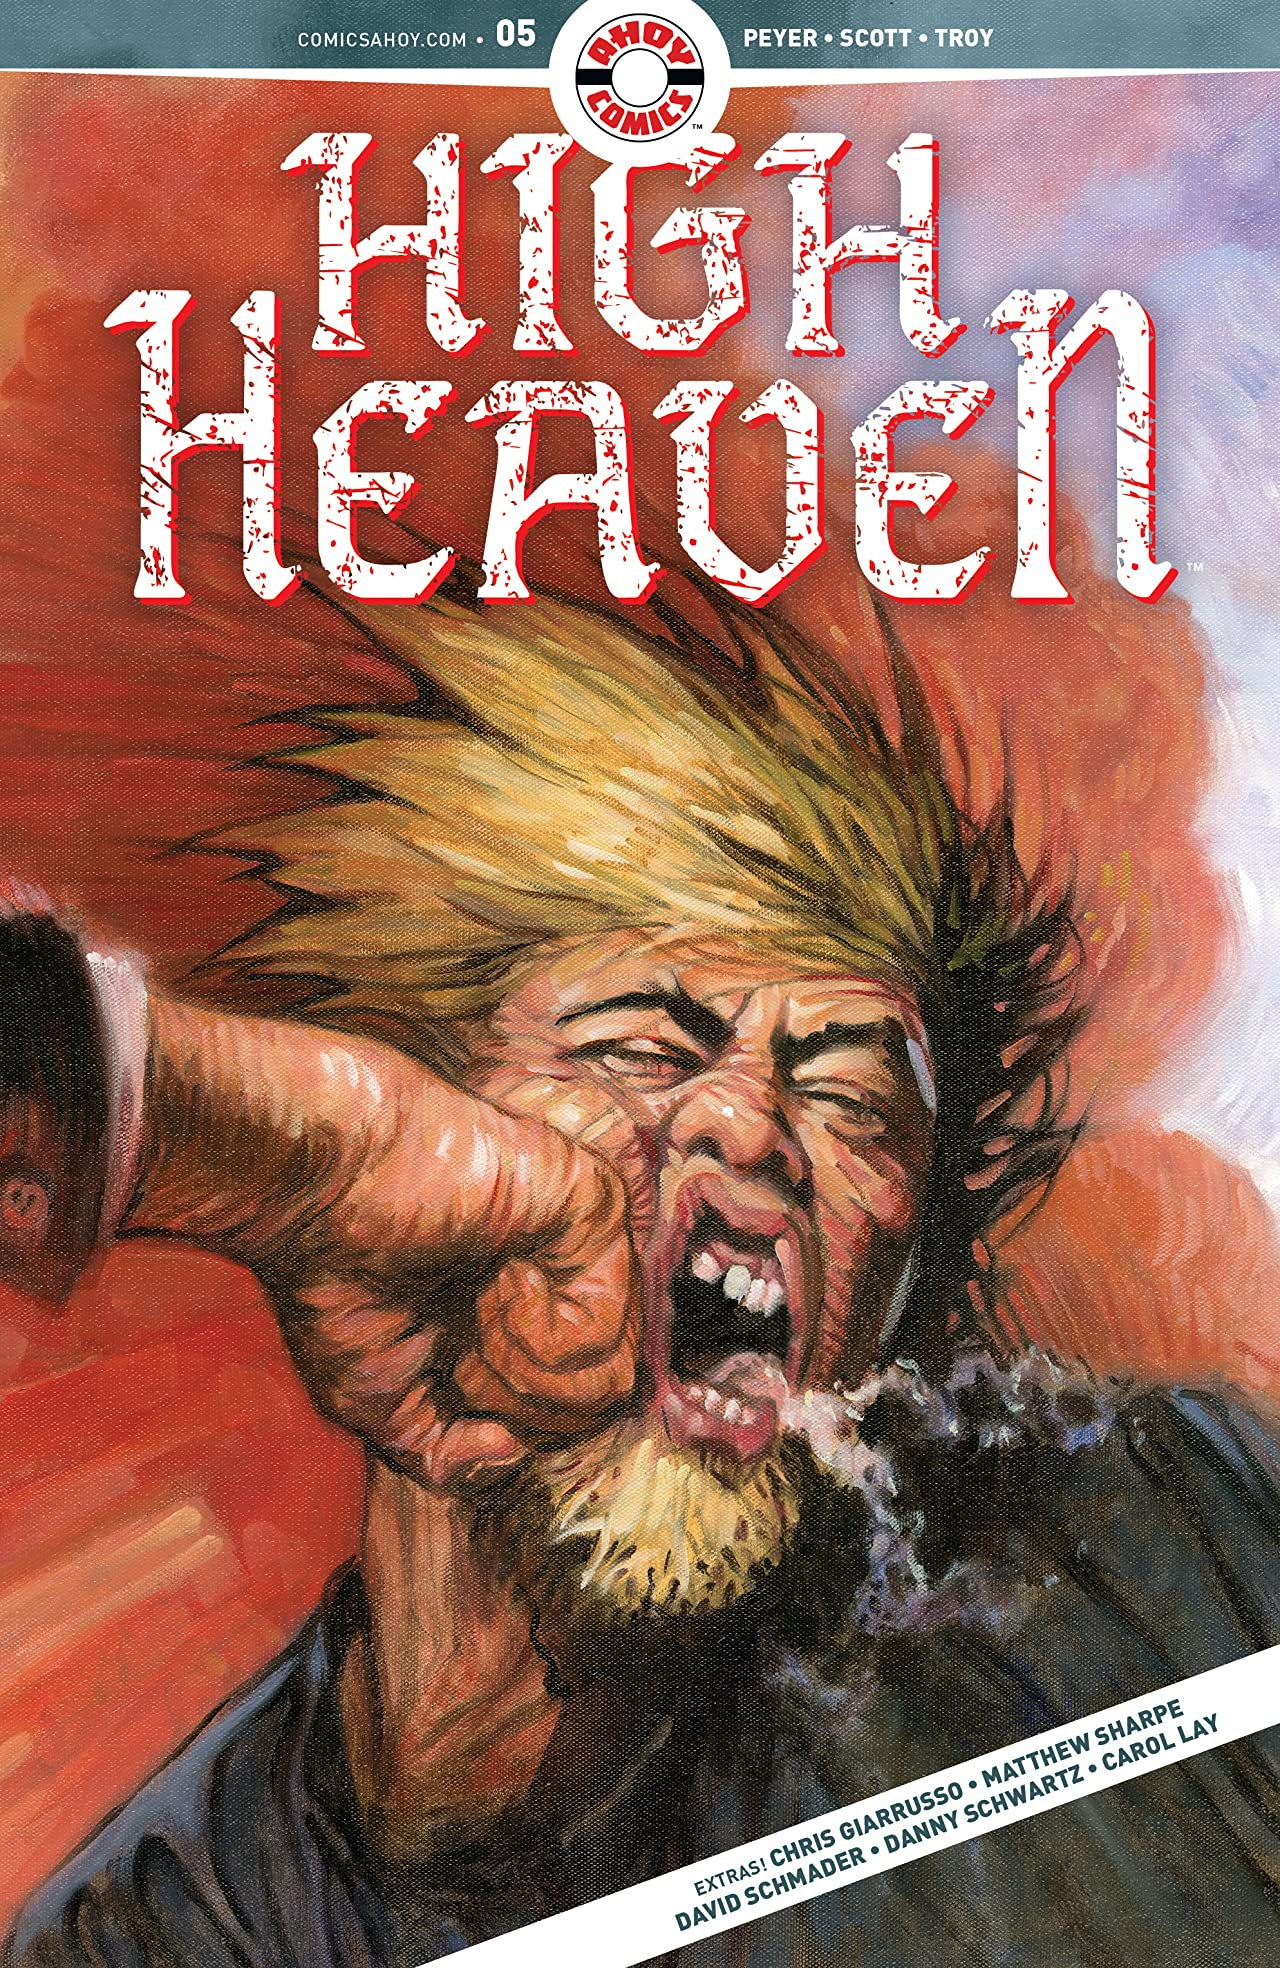 High Heaven #5